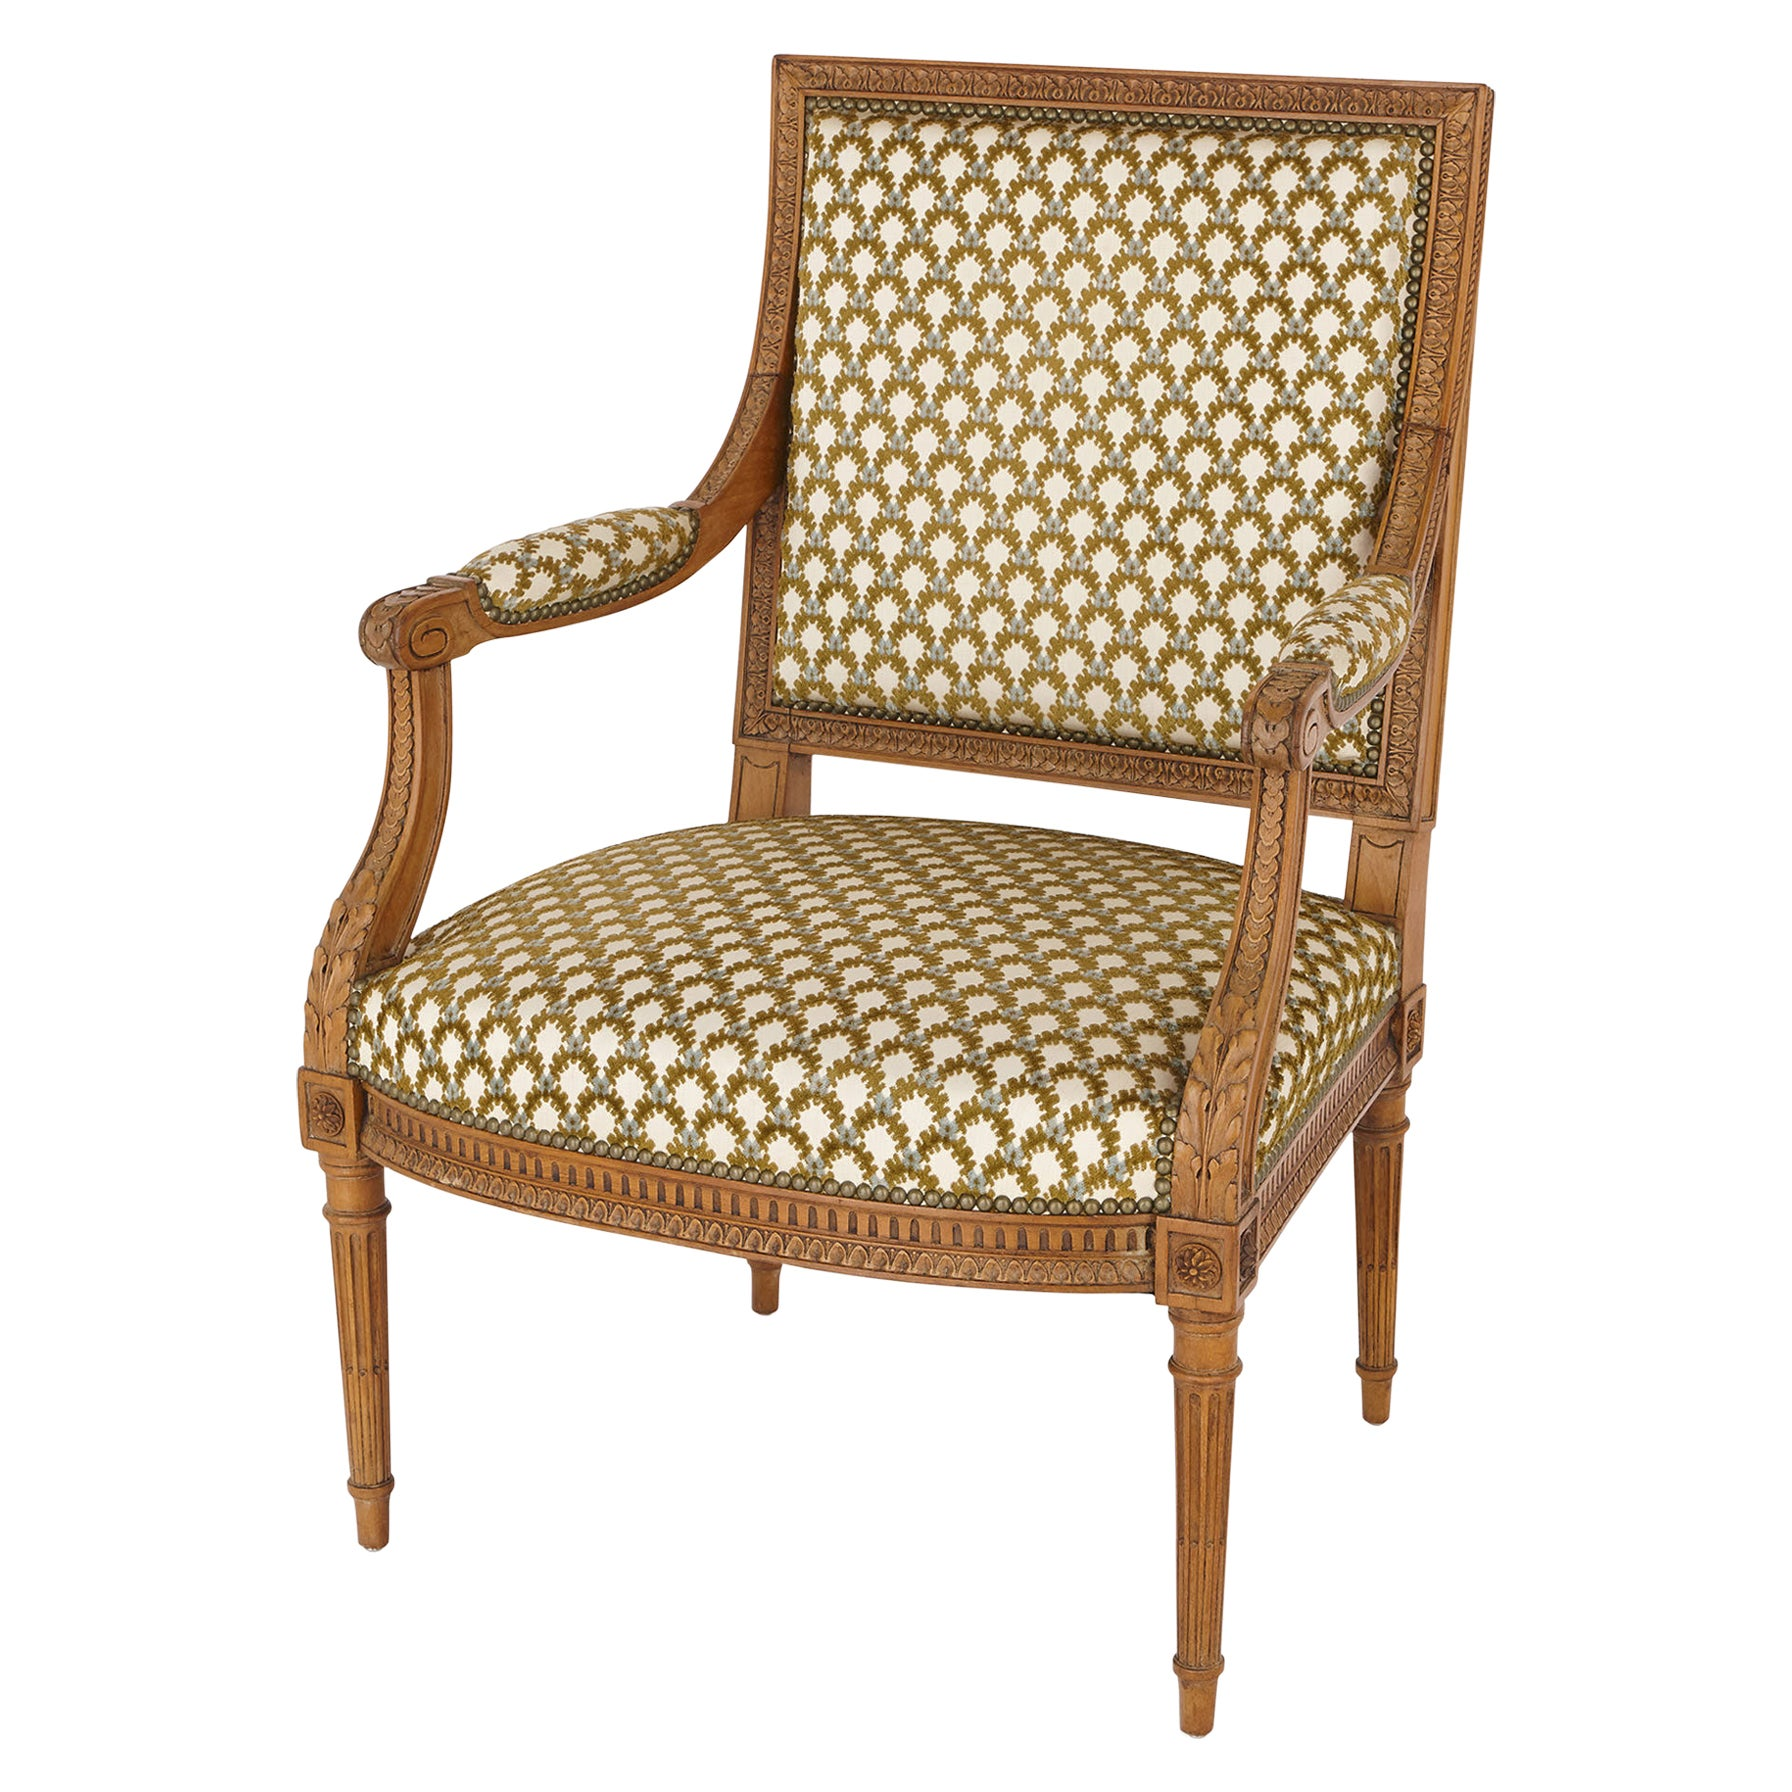 Antique Silk-Upholstered Beechwood Armchair by Linke